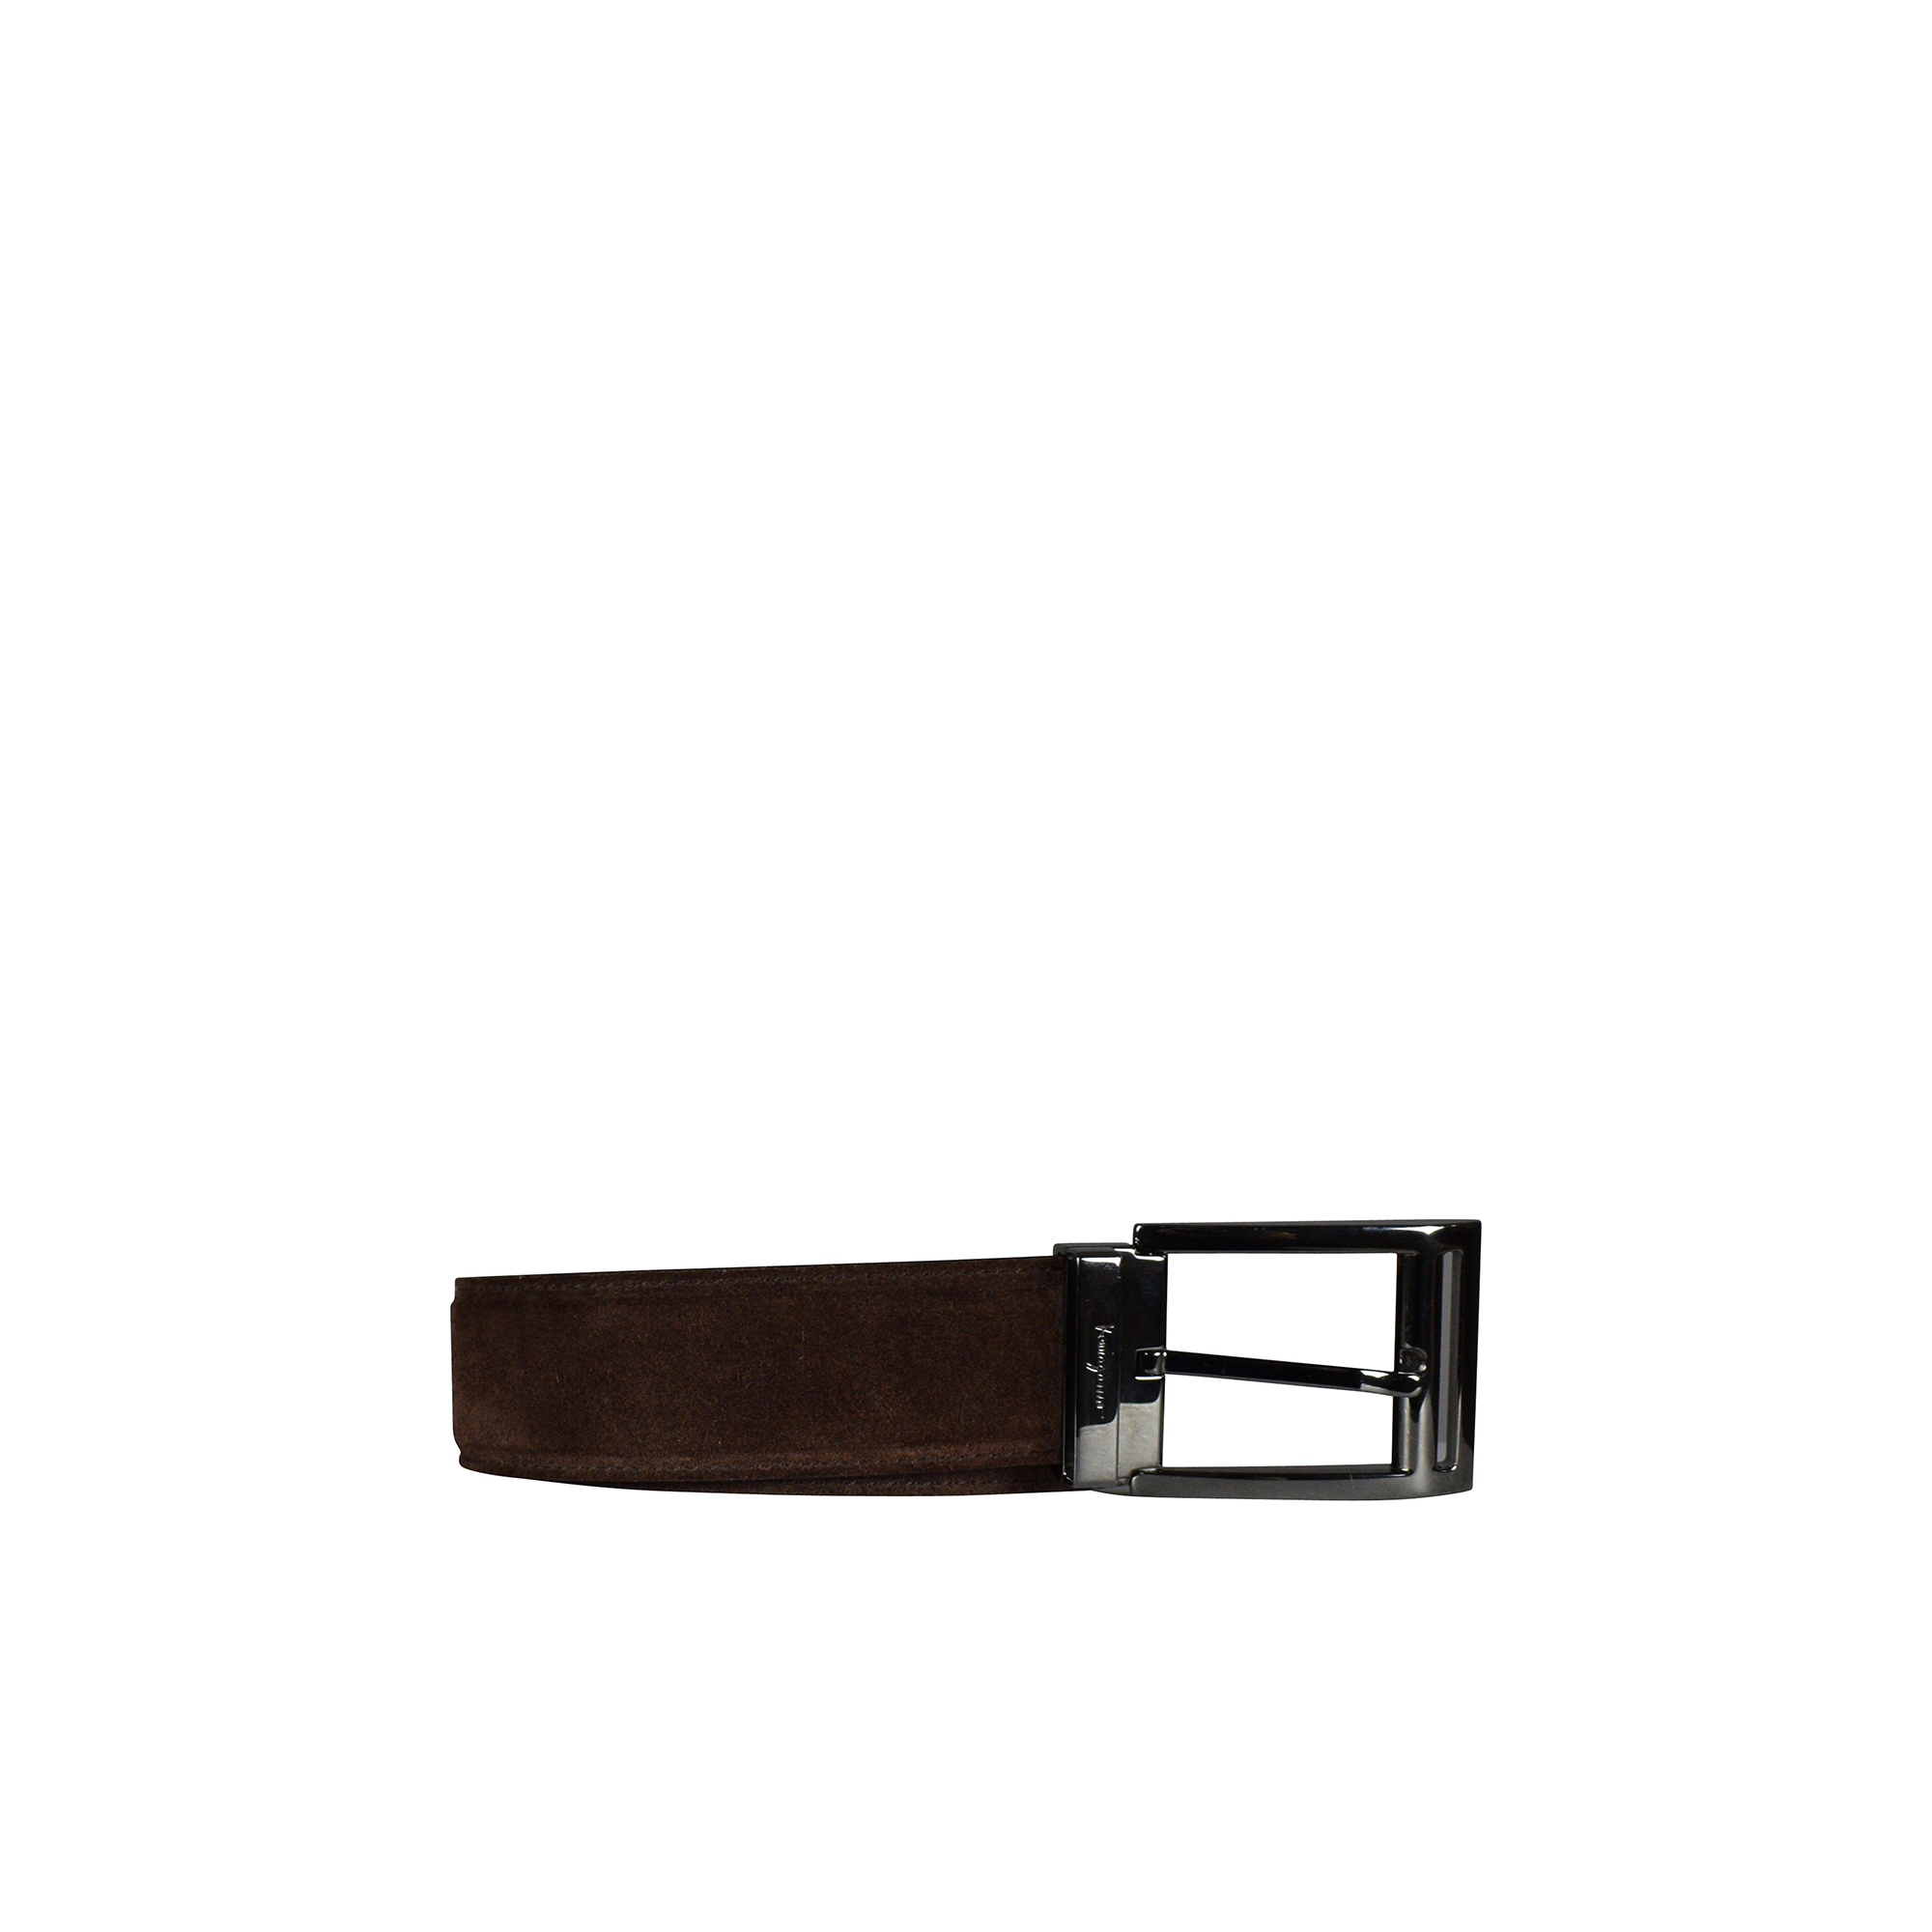 Salvatore Ferragamo belt in brown suede.